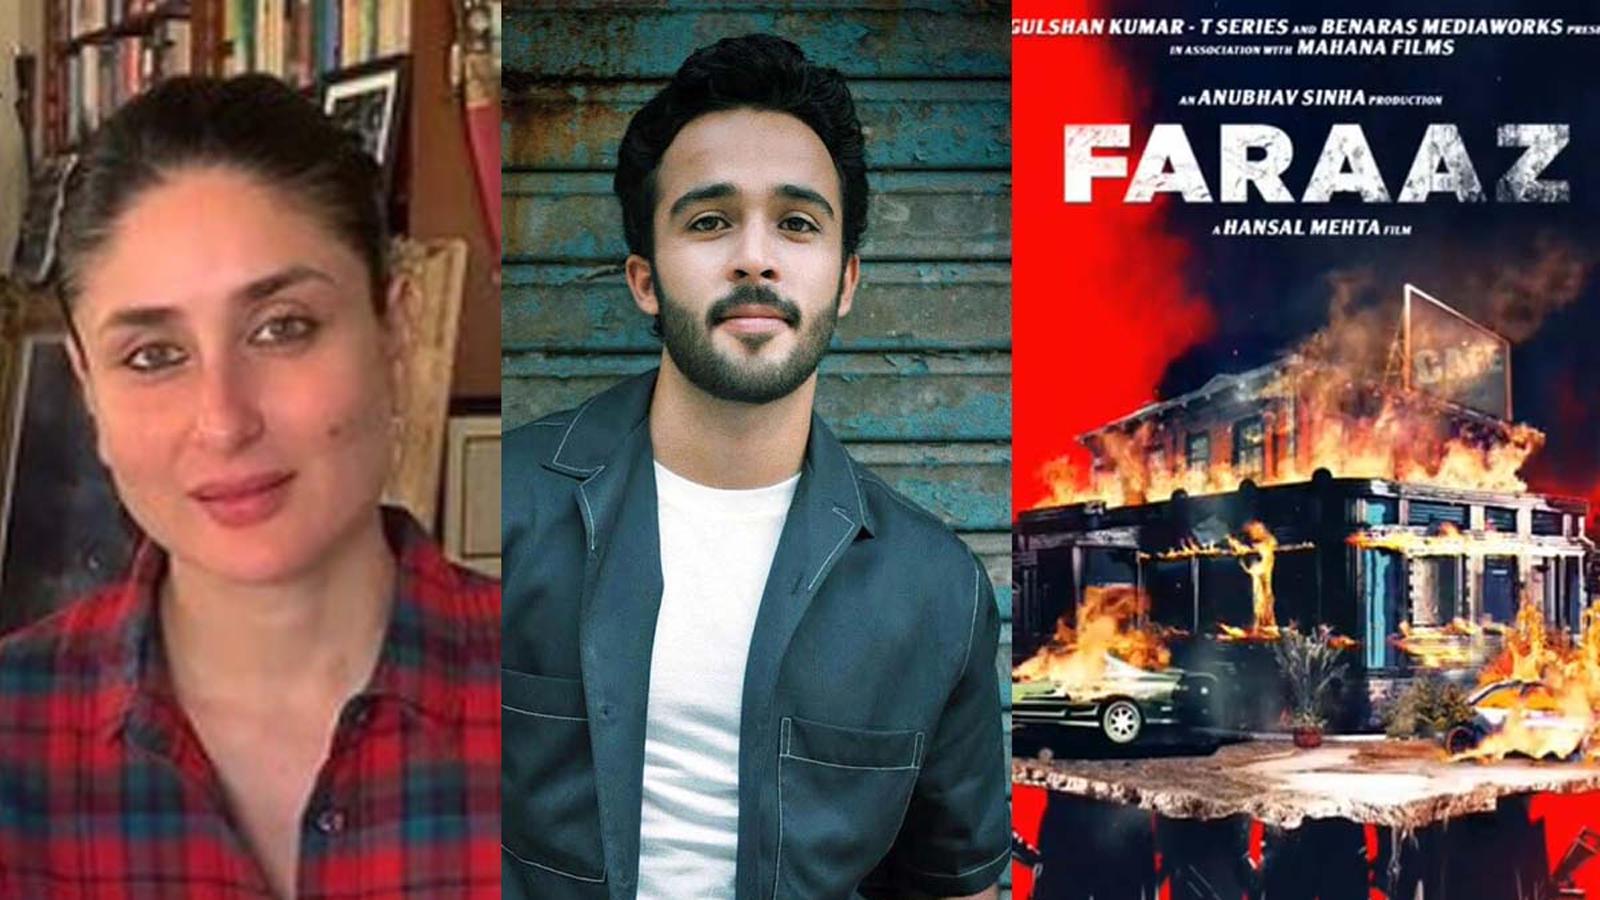 kareena-kapoor-khan-cheers-for-cousin-zahan-kapoor-as-the-first-look-of-his-debut-film-faraaz-releases